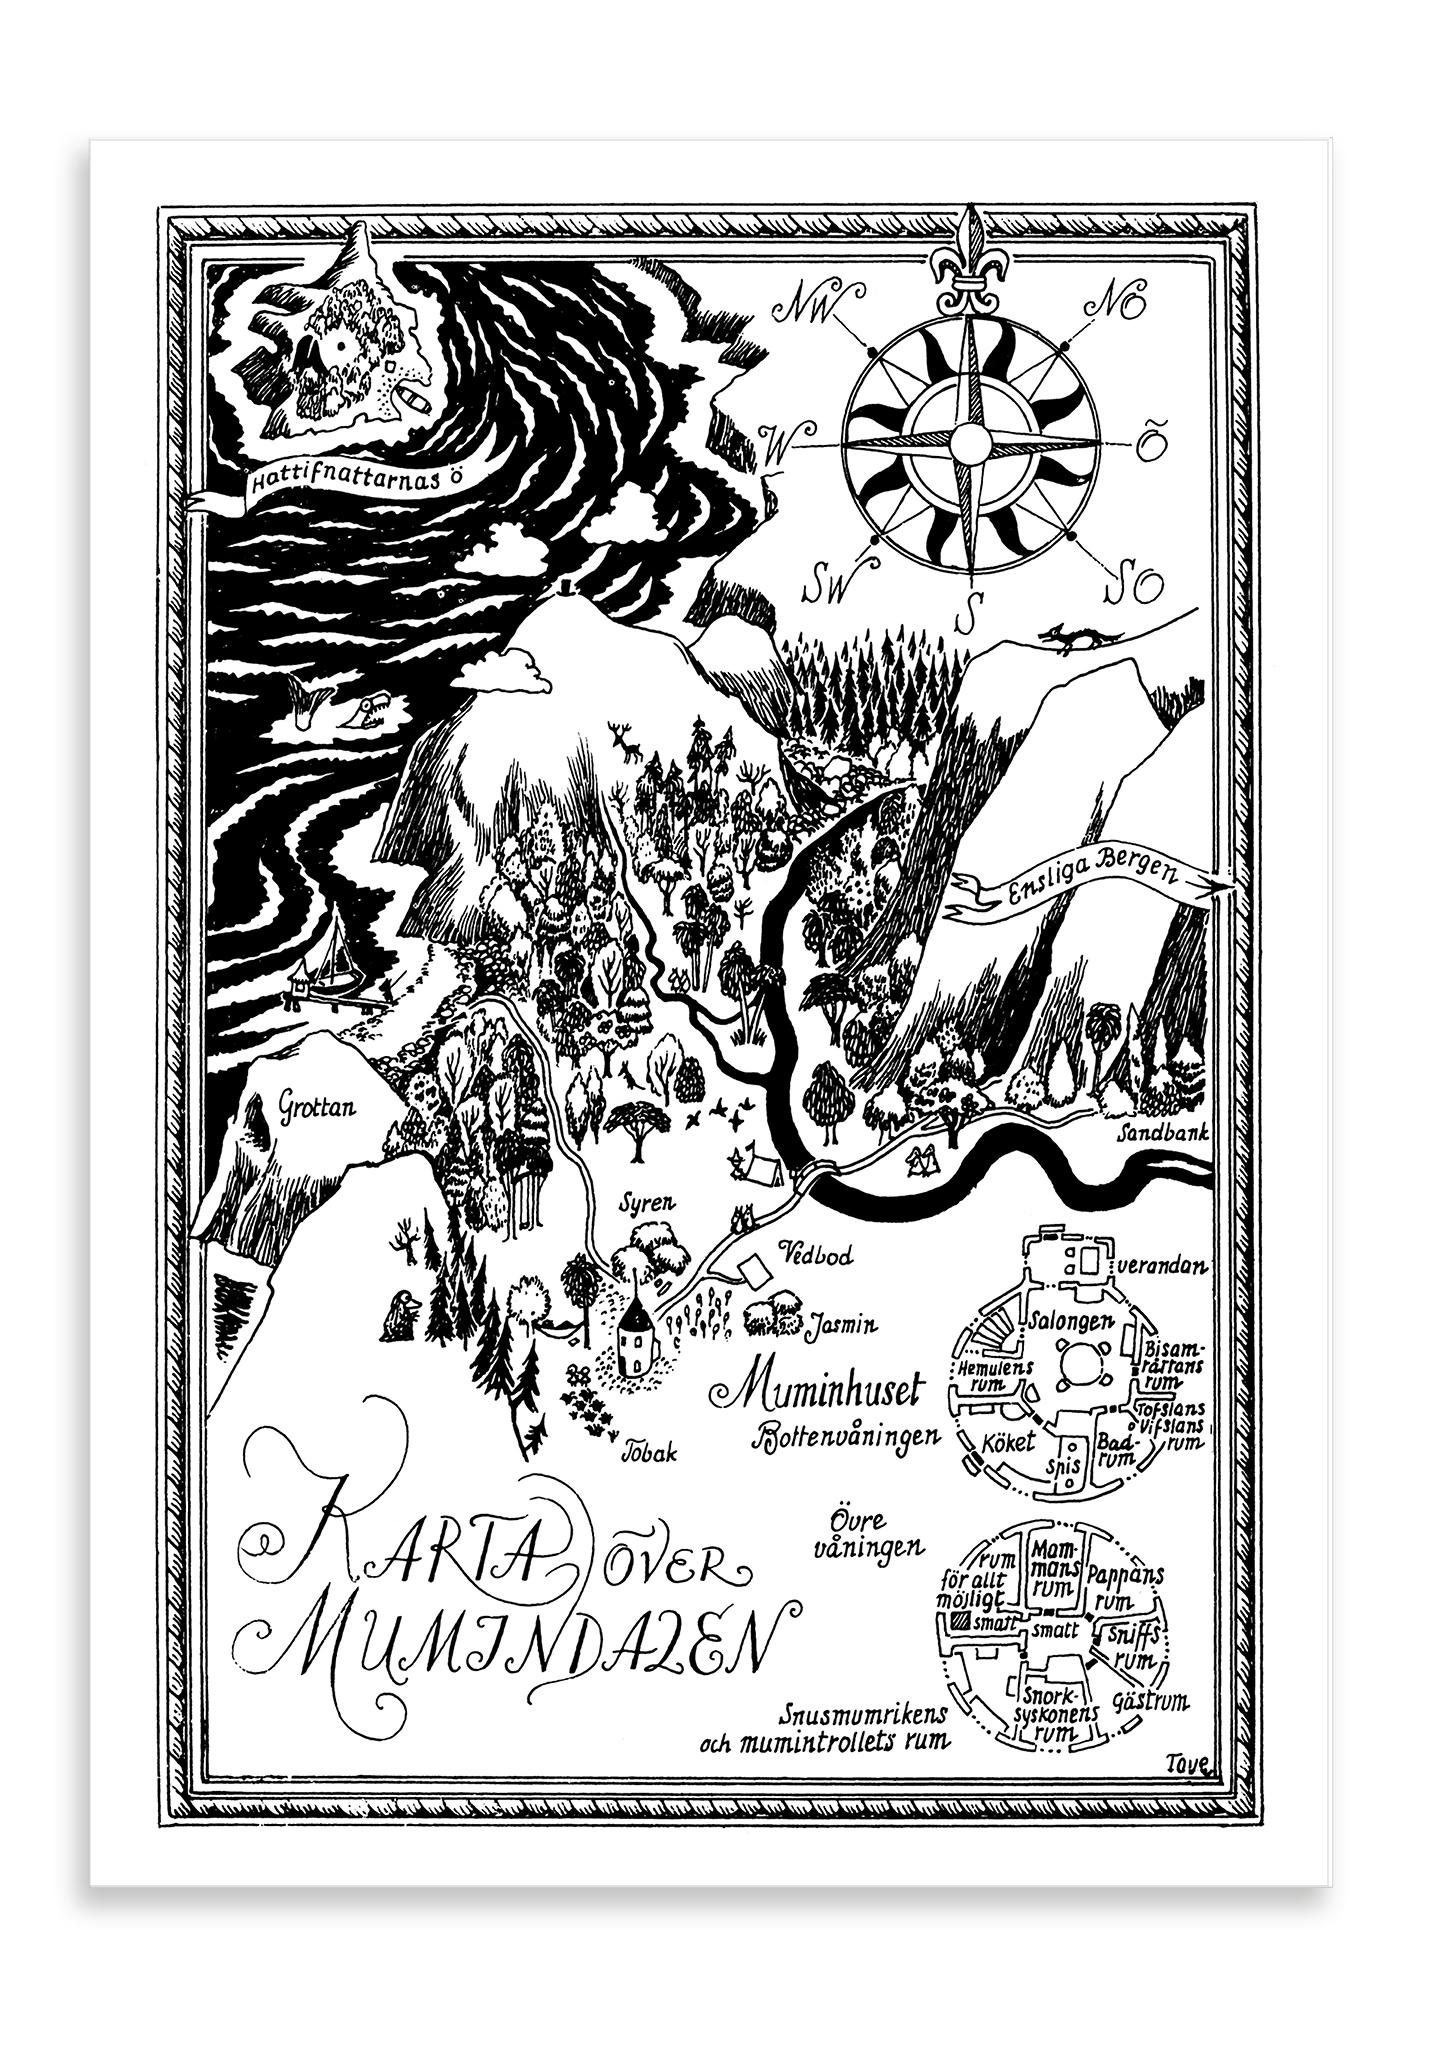 Putinki Postcard Karta över Mumindalen